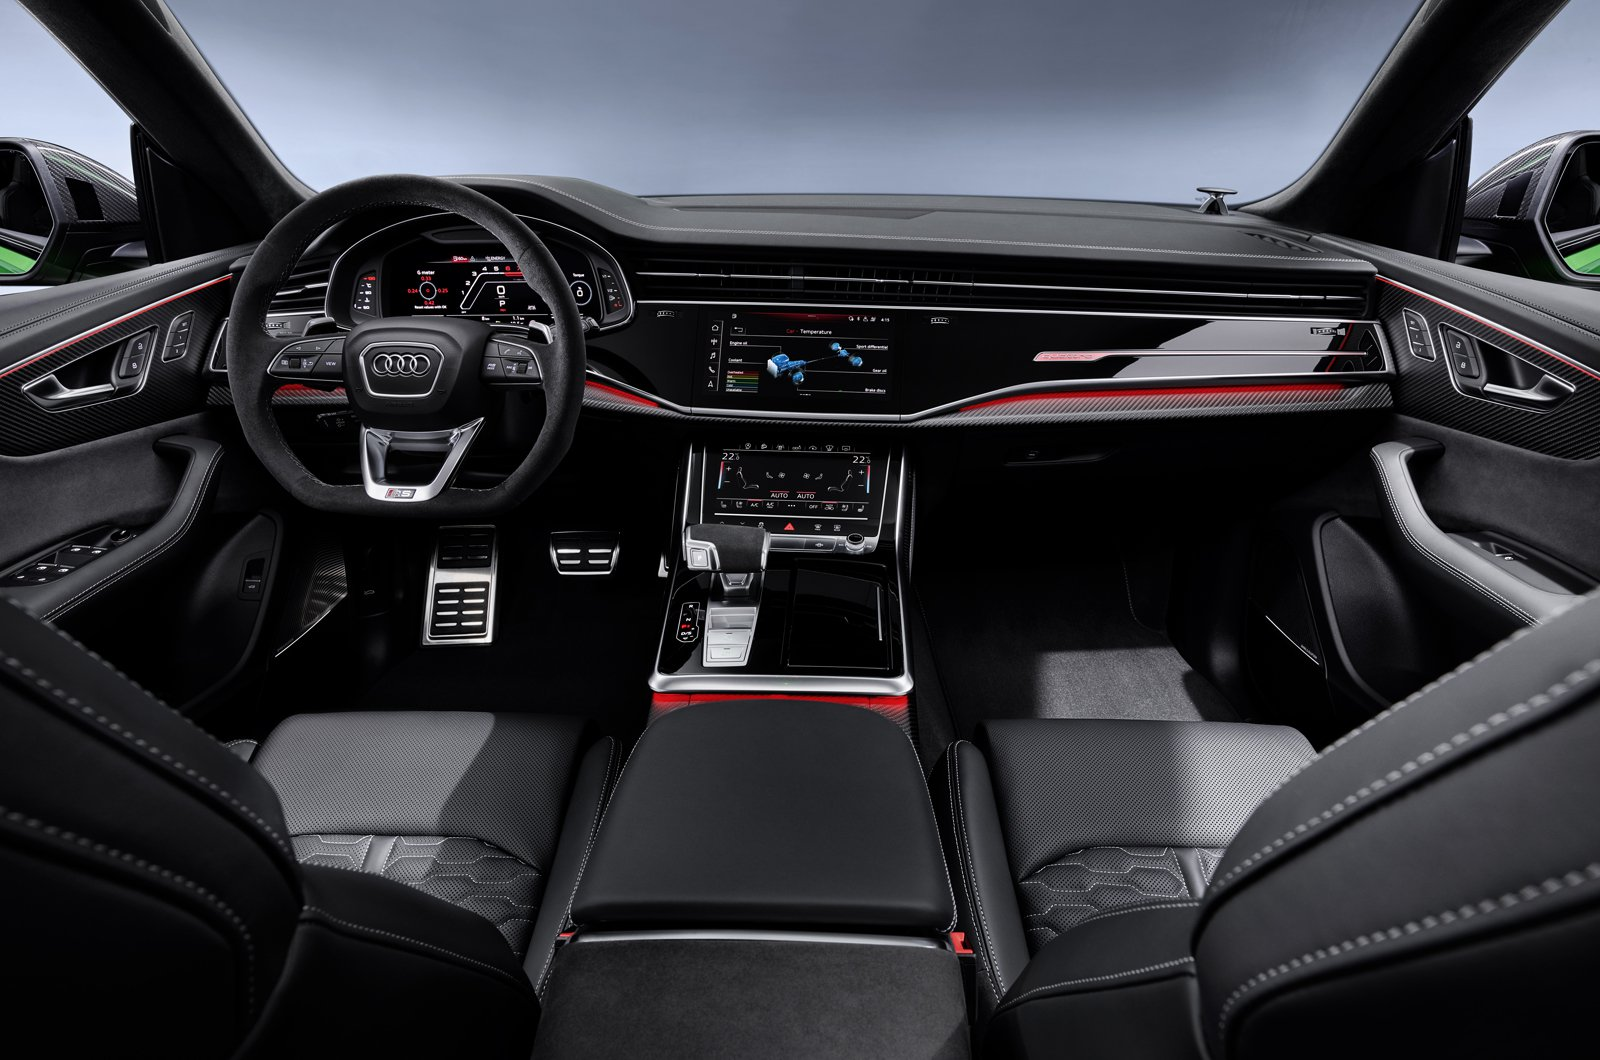 Audi RS Q8 dashboard